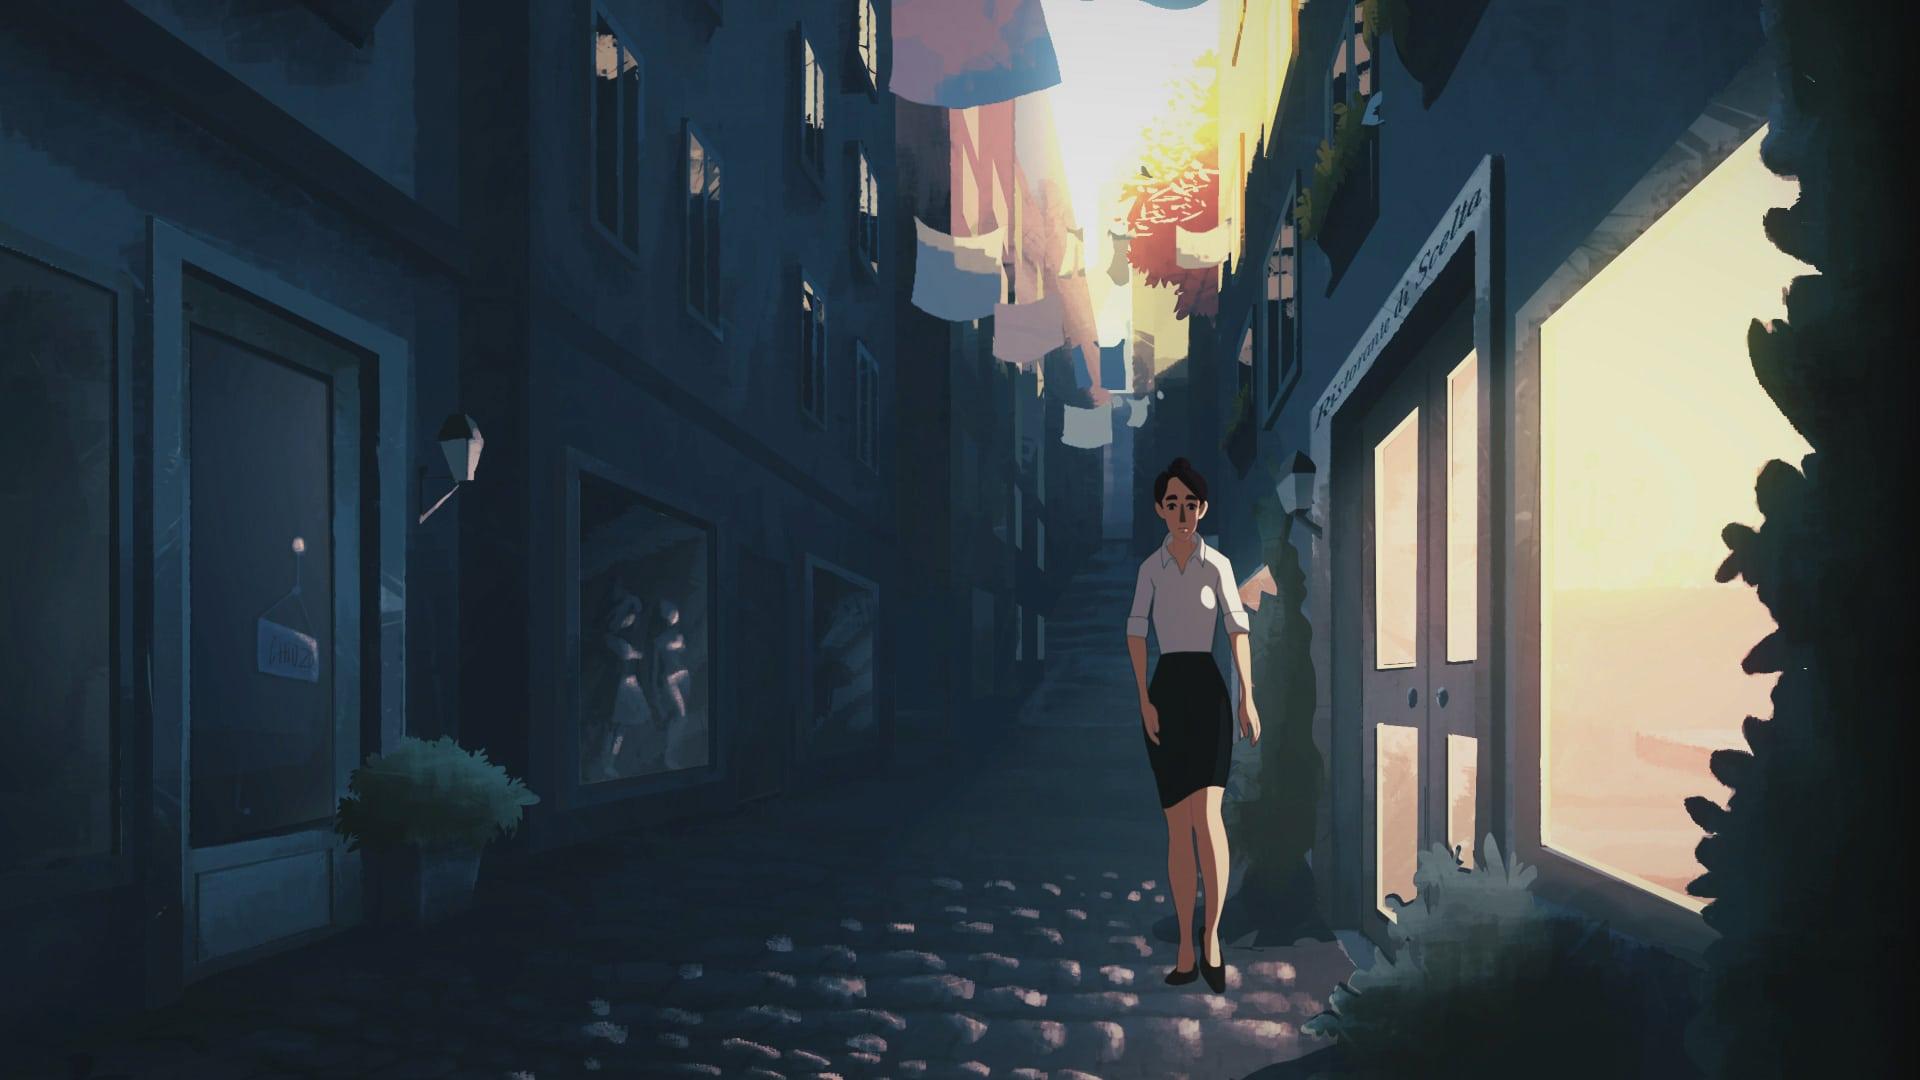 International win for Animation 'Riflesso'